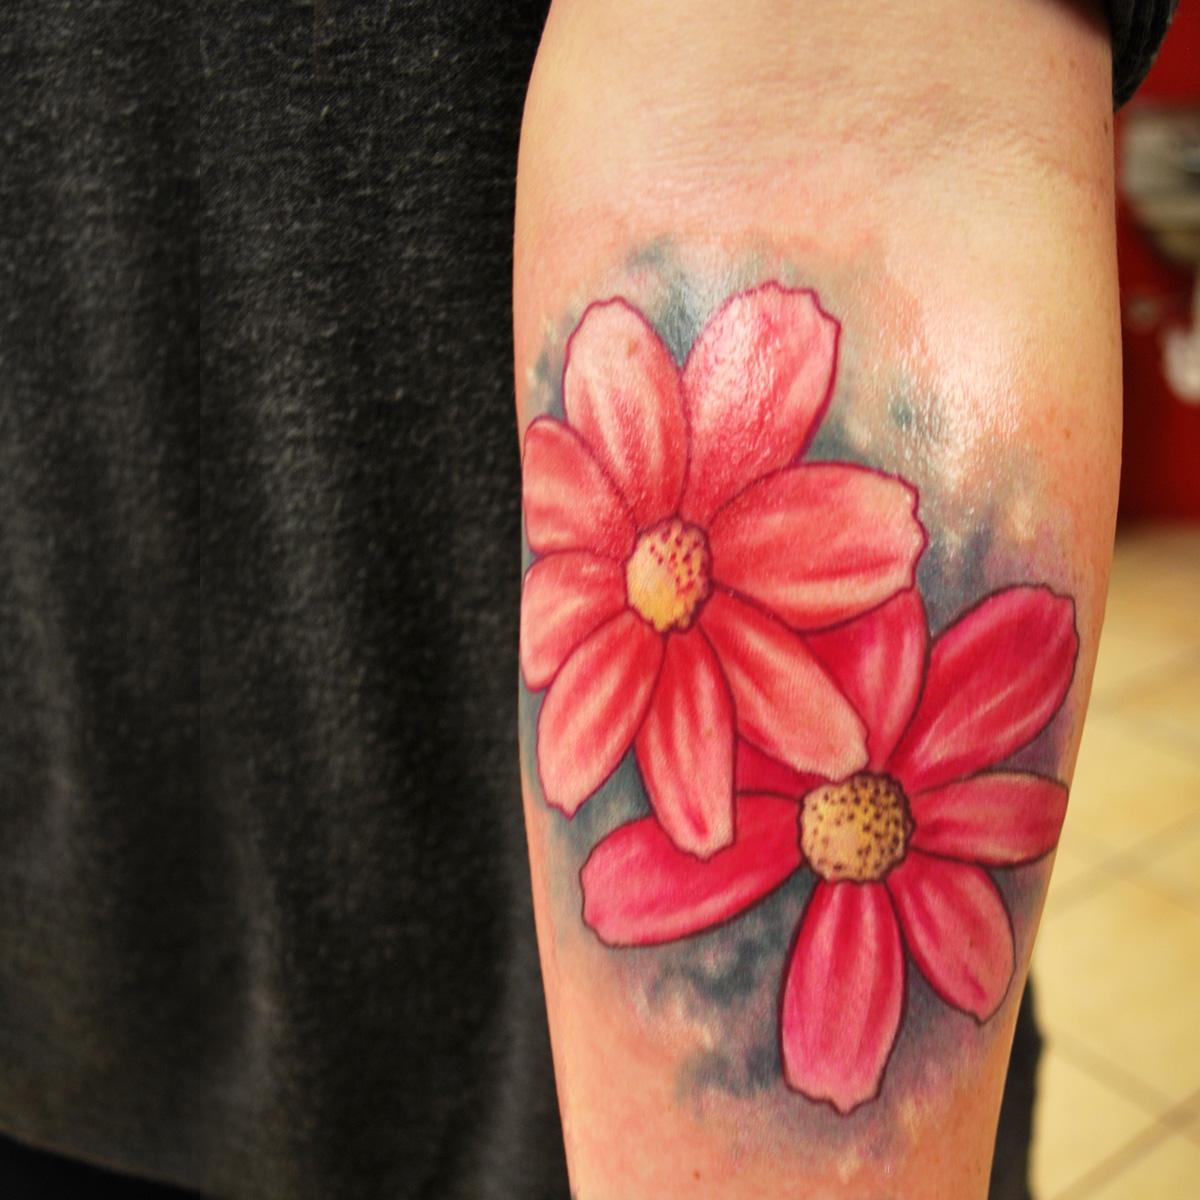 Color tattoo by muecke - Tattoo.com